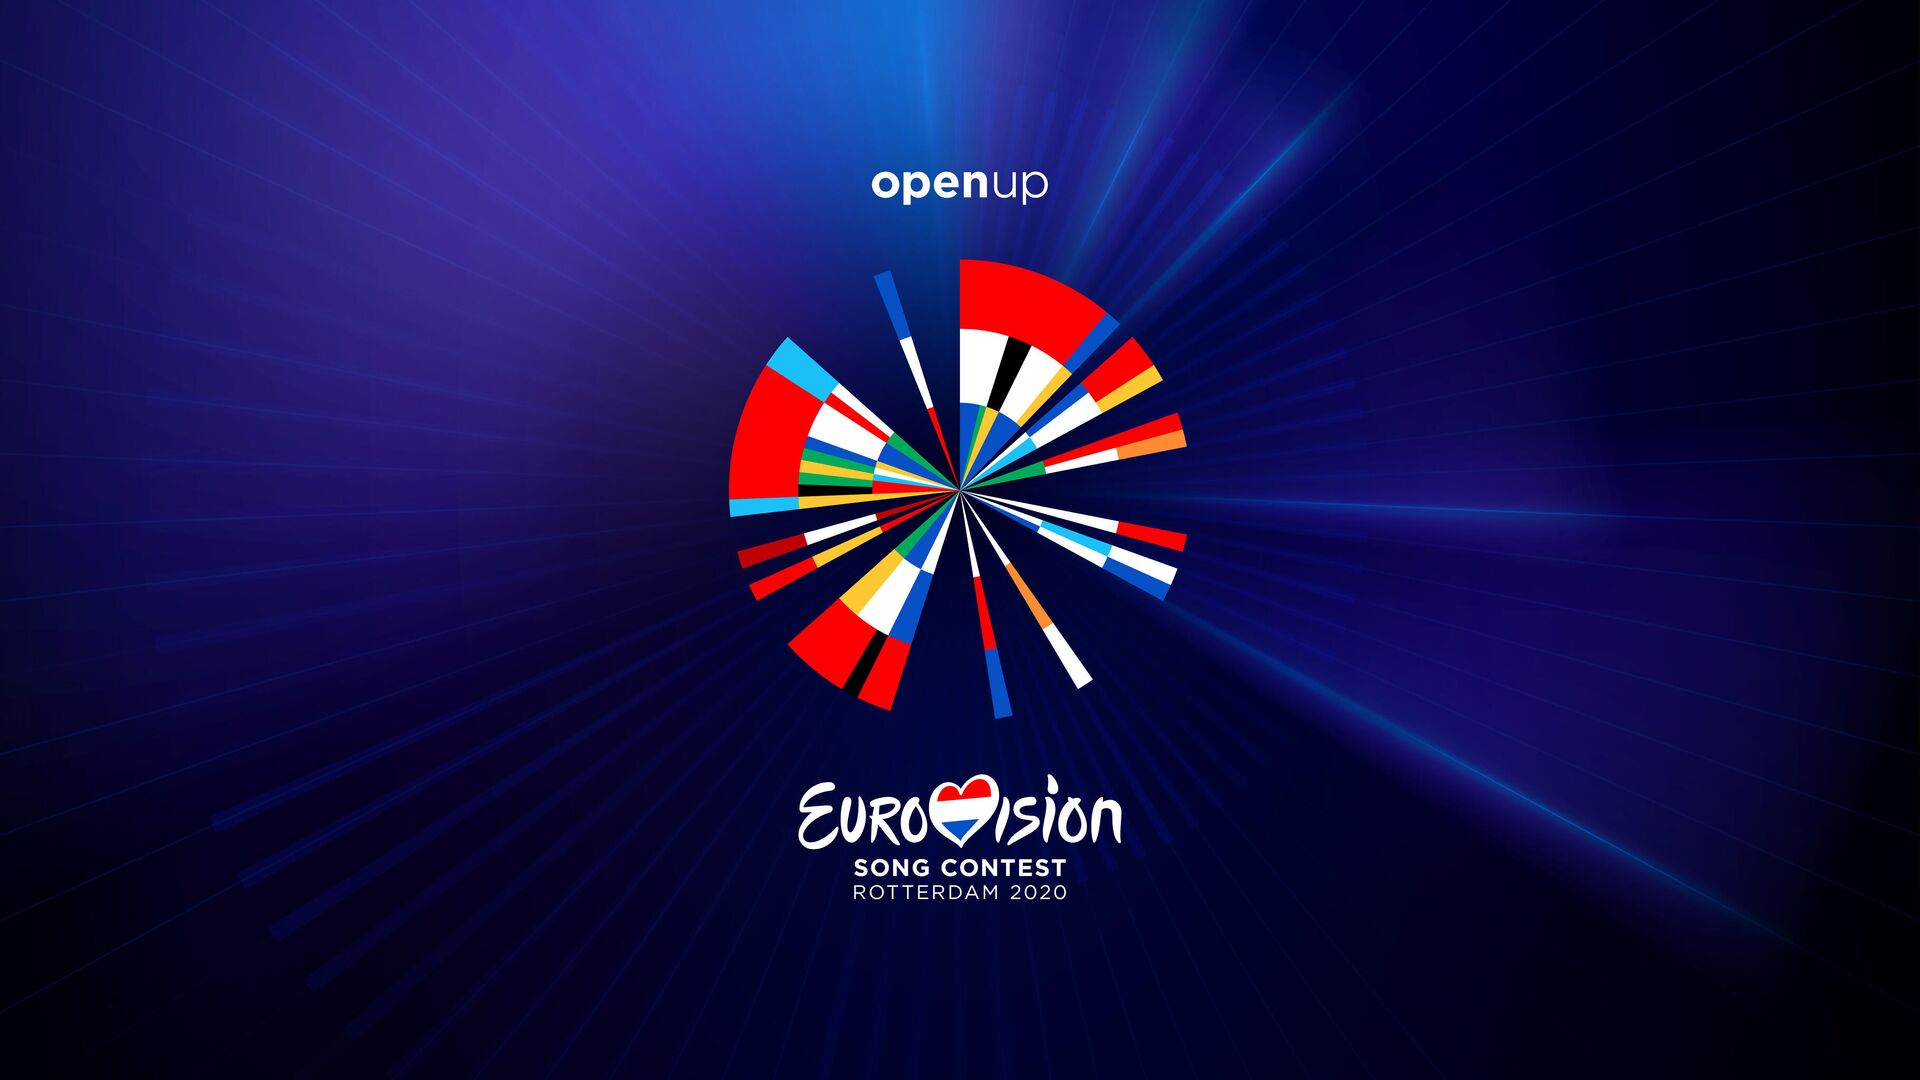 Евровидение 2020 - РИА Новости, 1920, 26.10.2020